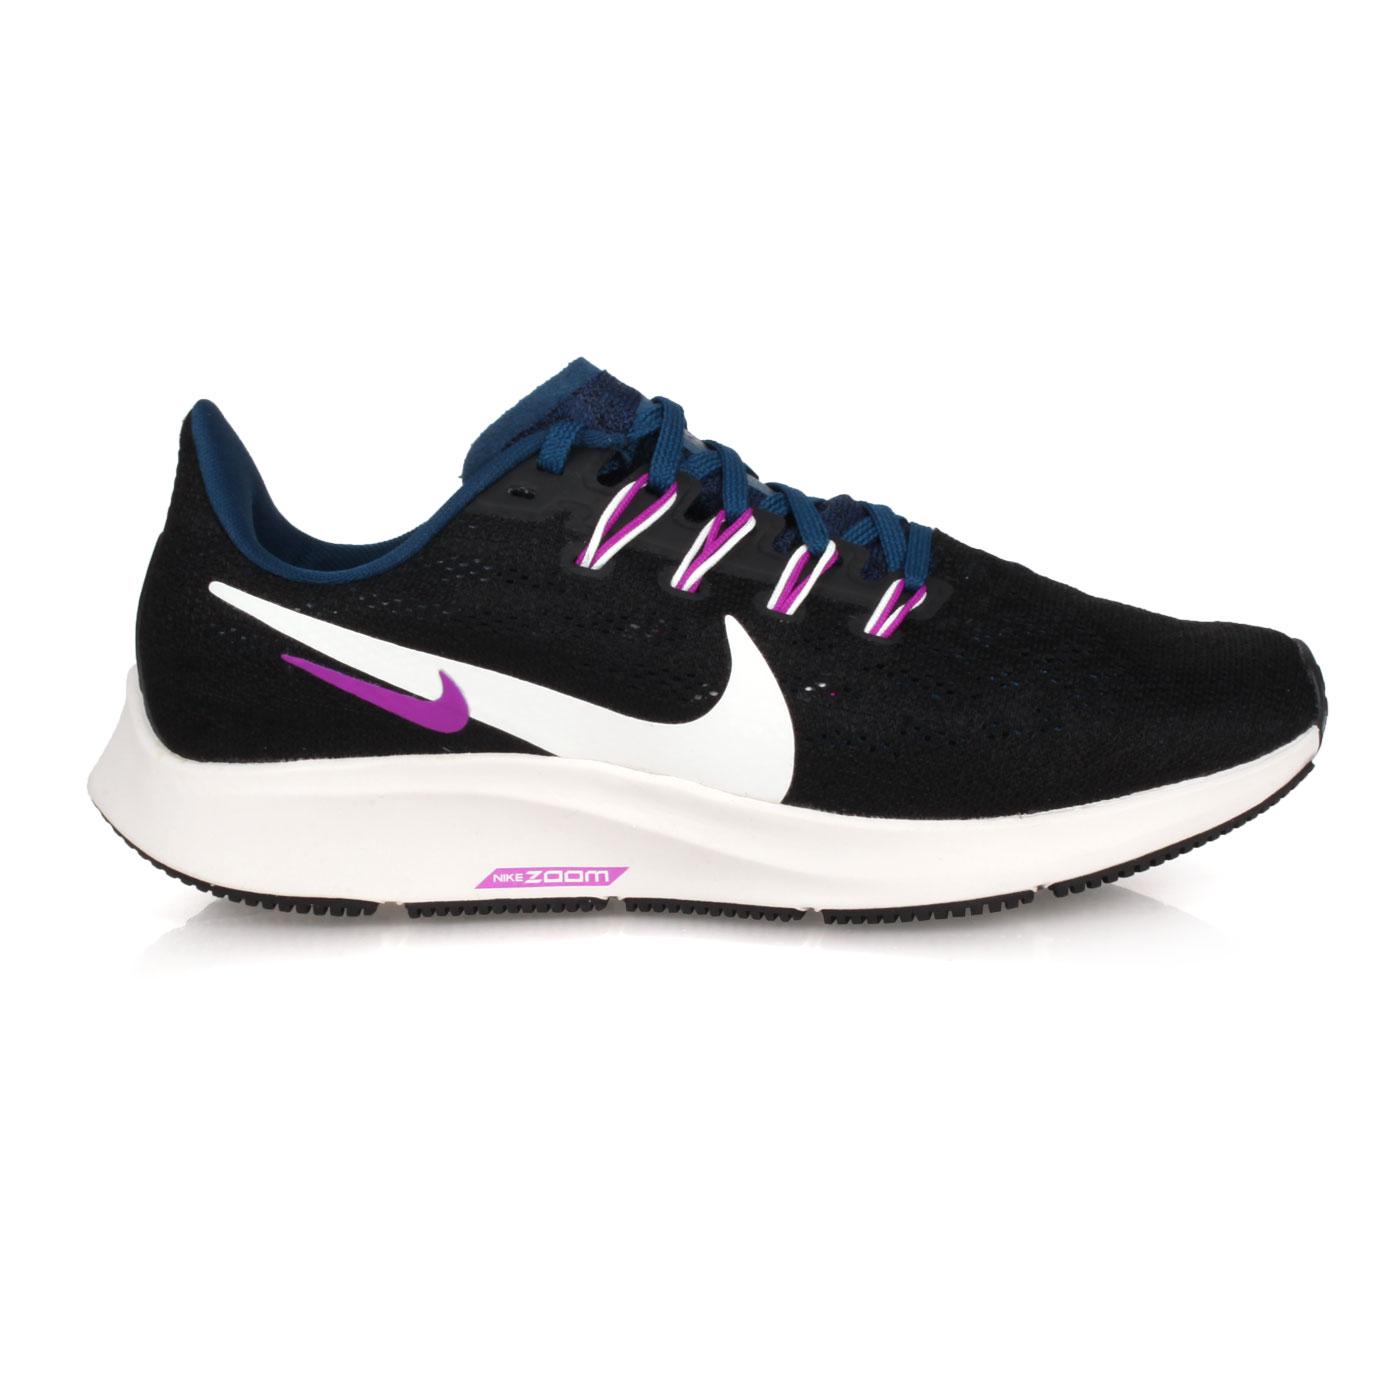 NIKE 女款慢跑鞋  @WMNS AIR ZOOM PEGASUS 36@AQ2210005 - 黑紫白墨藍